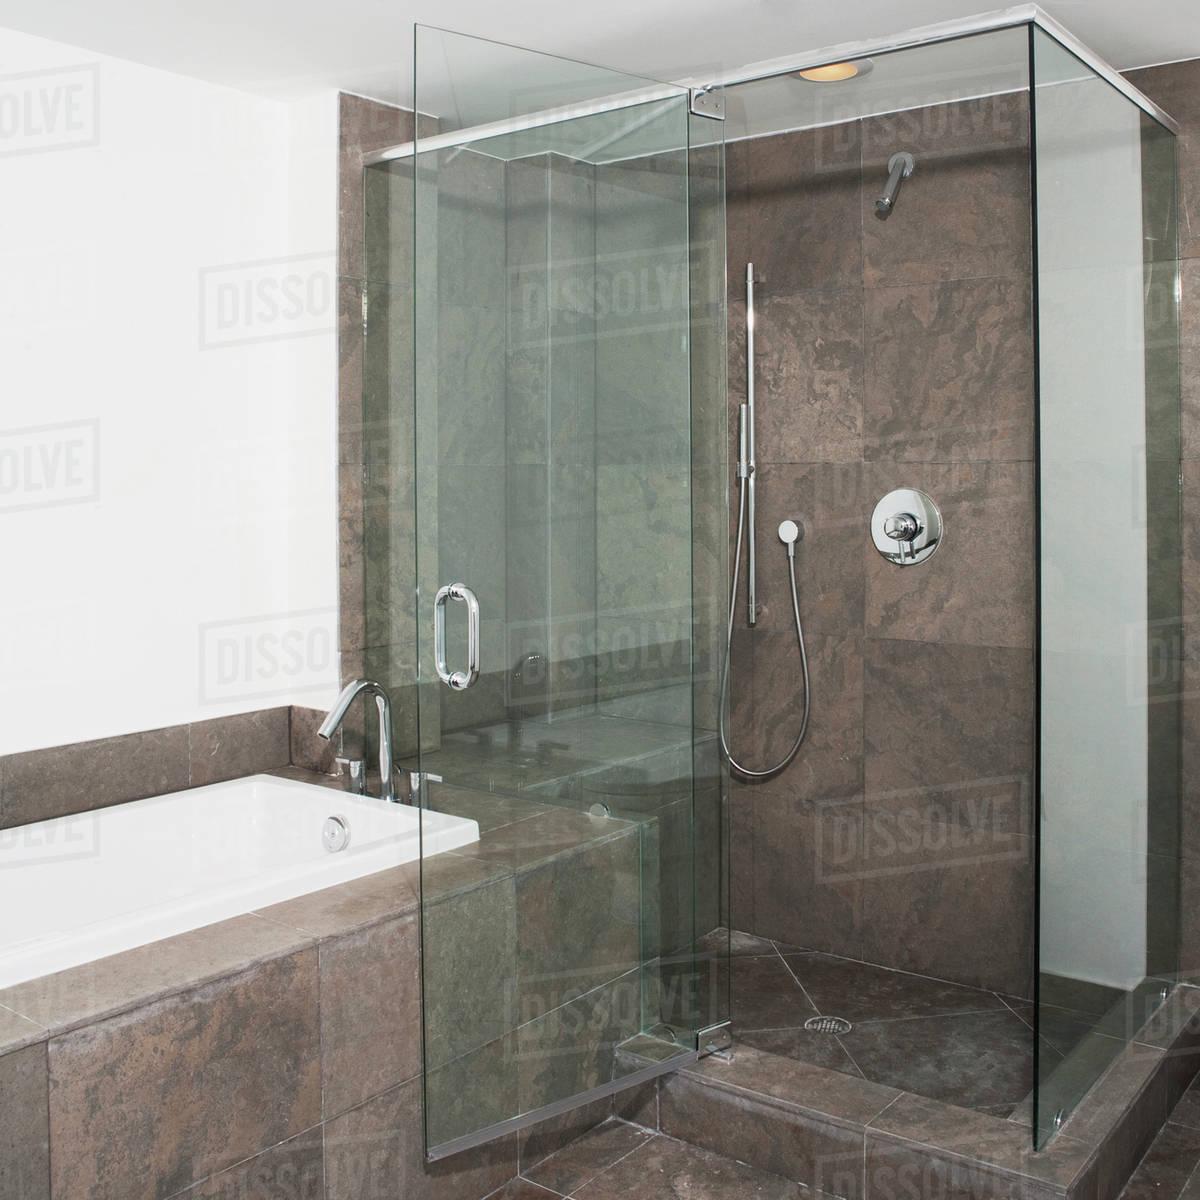 Super Glass Doors Of Shower And Bathtub In Modern Bathroom Stock Photo Download Free Architecture Designs Scobabritishbridgeorg